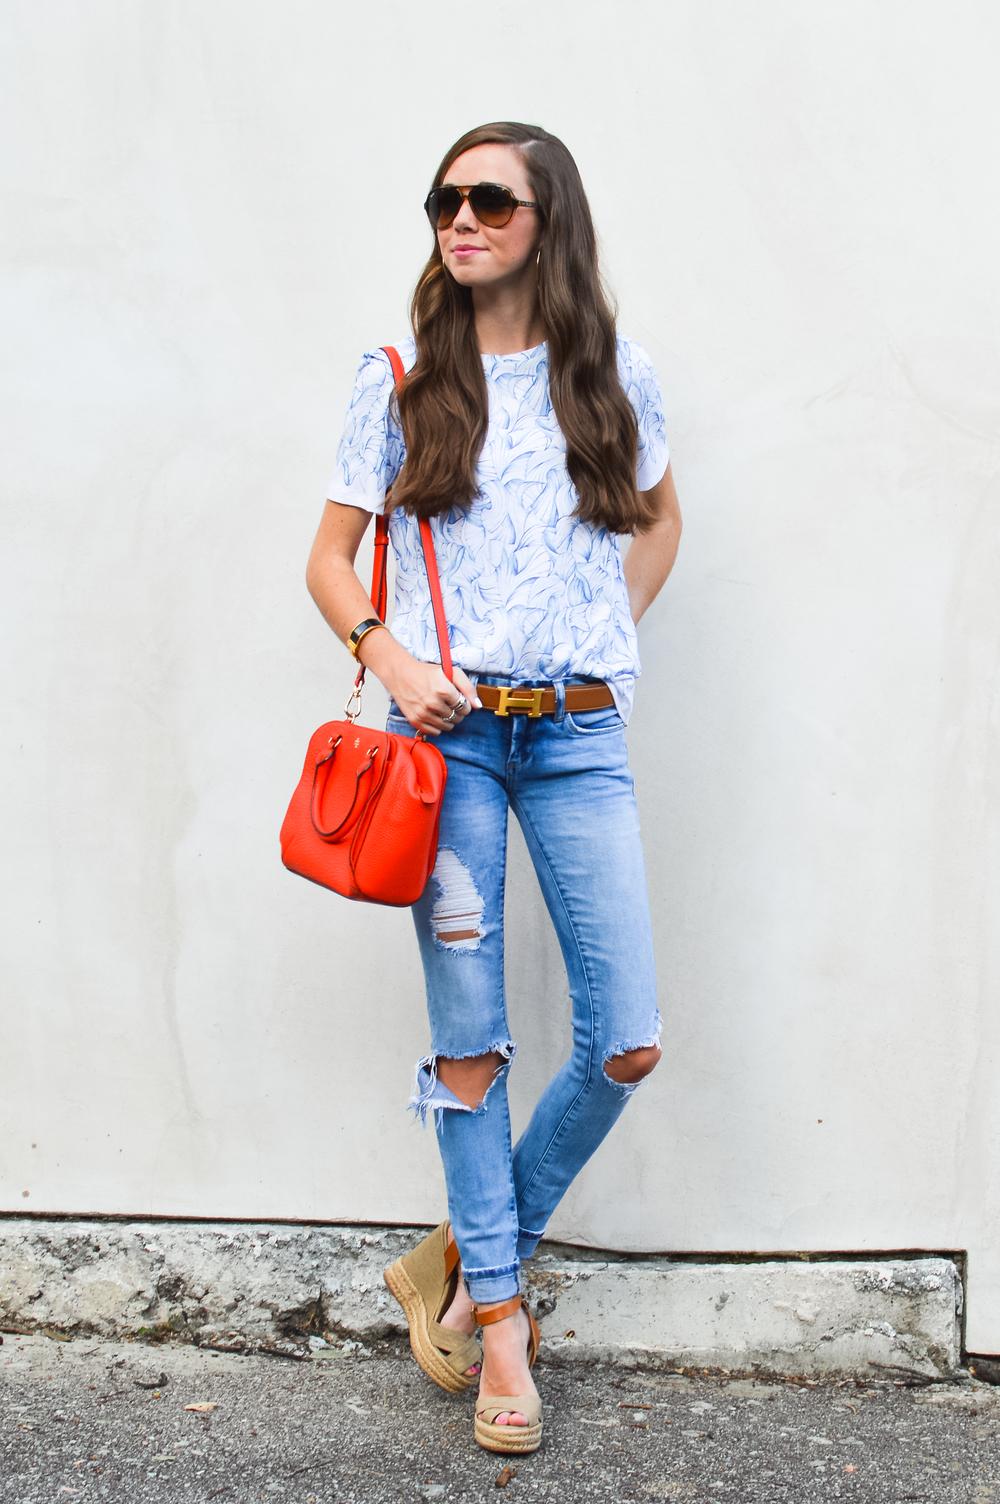 lcb_style_fashion_blogger_tory burch top (14 of 29).jpg